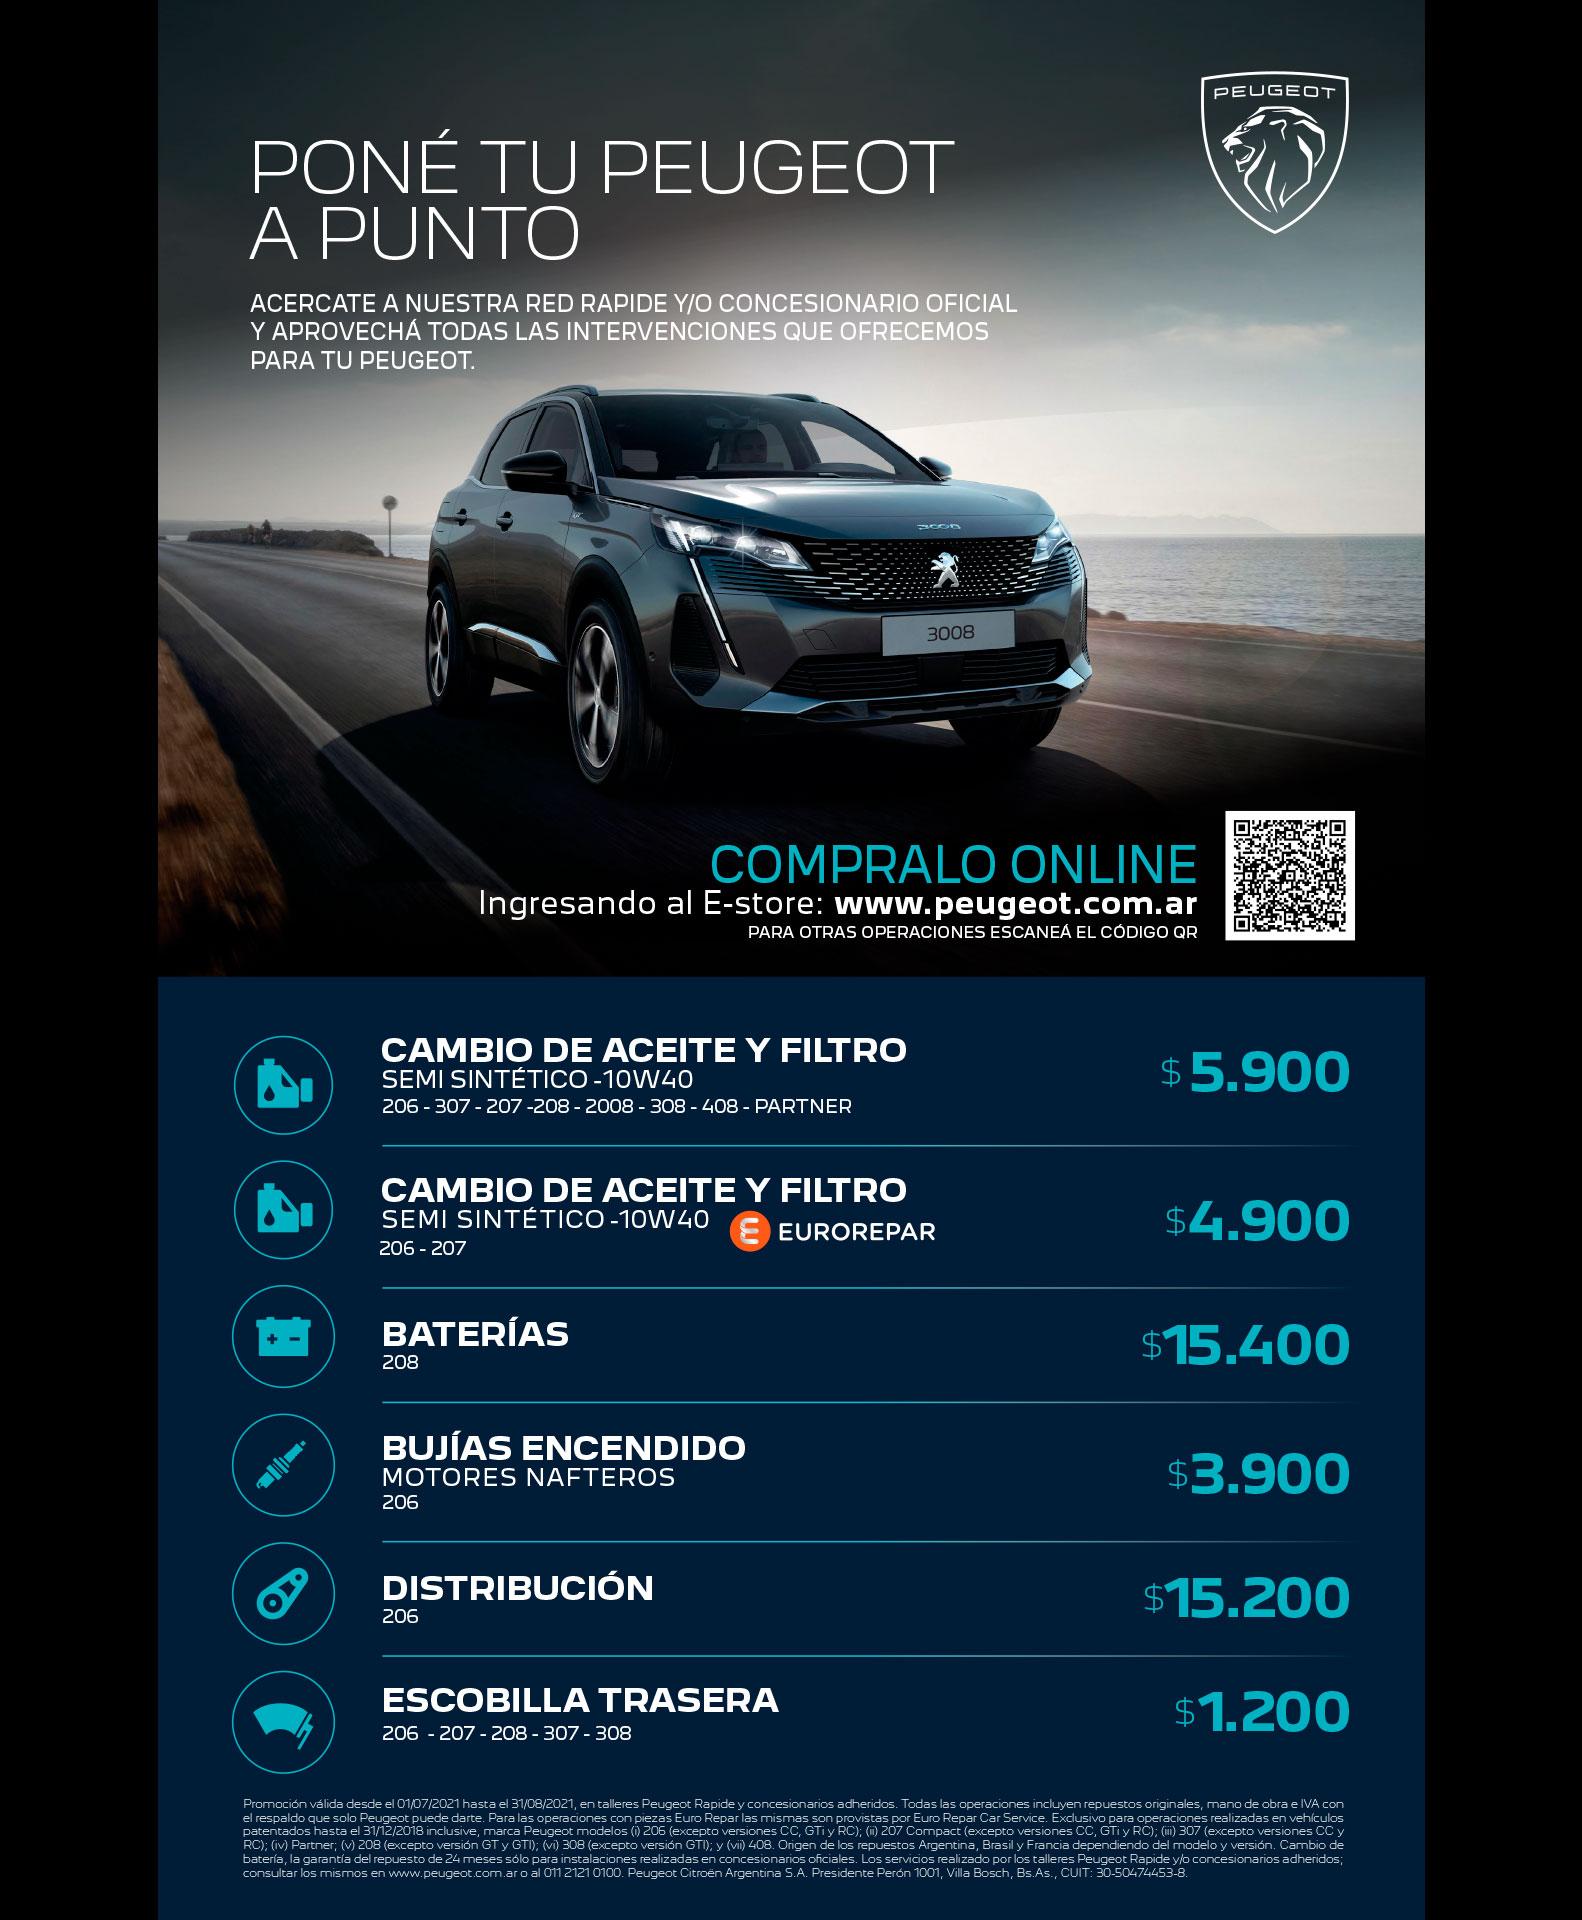 pone_a_punto_sva_auto_peugeot_ago21